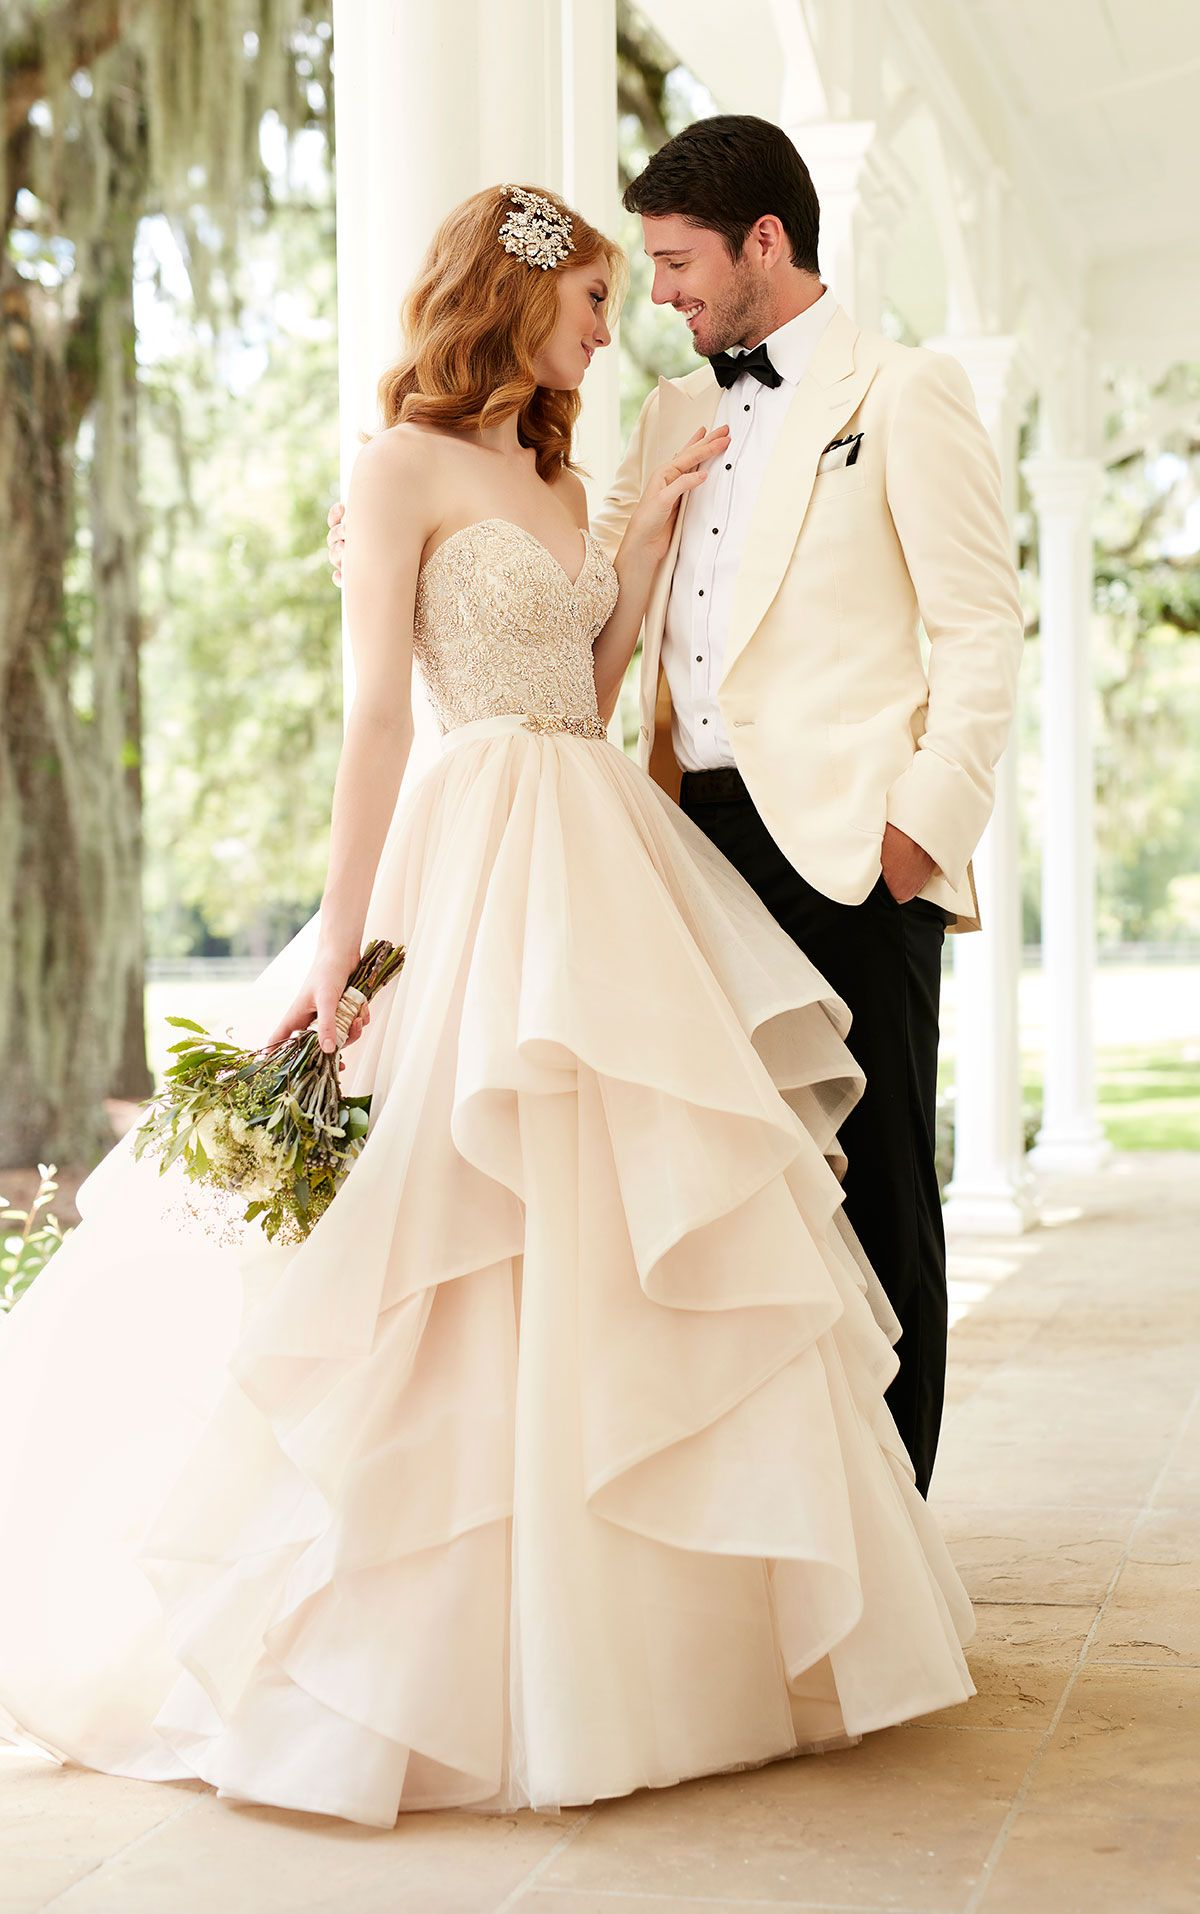 Wedding dress separates tulle wedding skirt wedding skirt